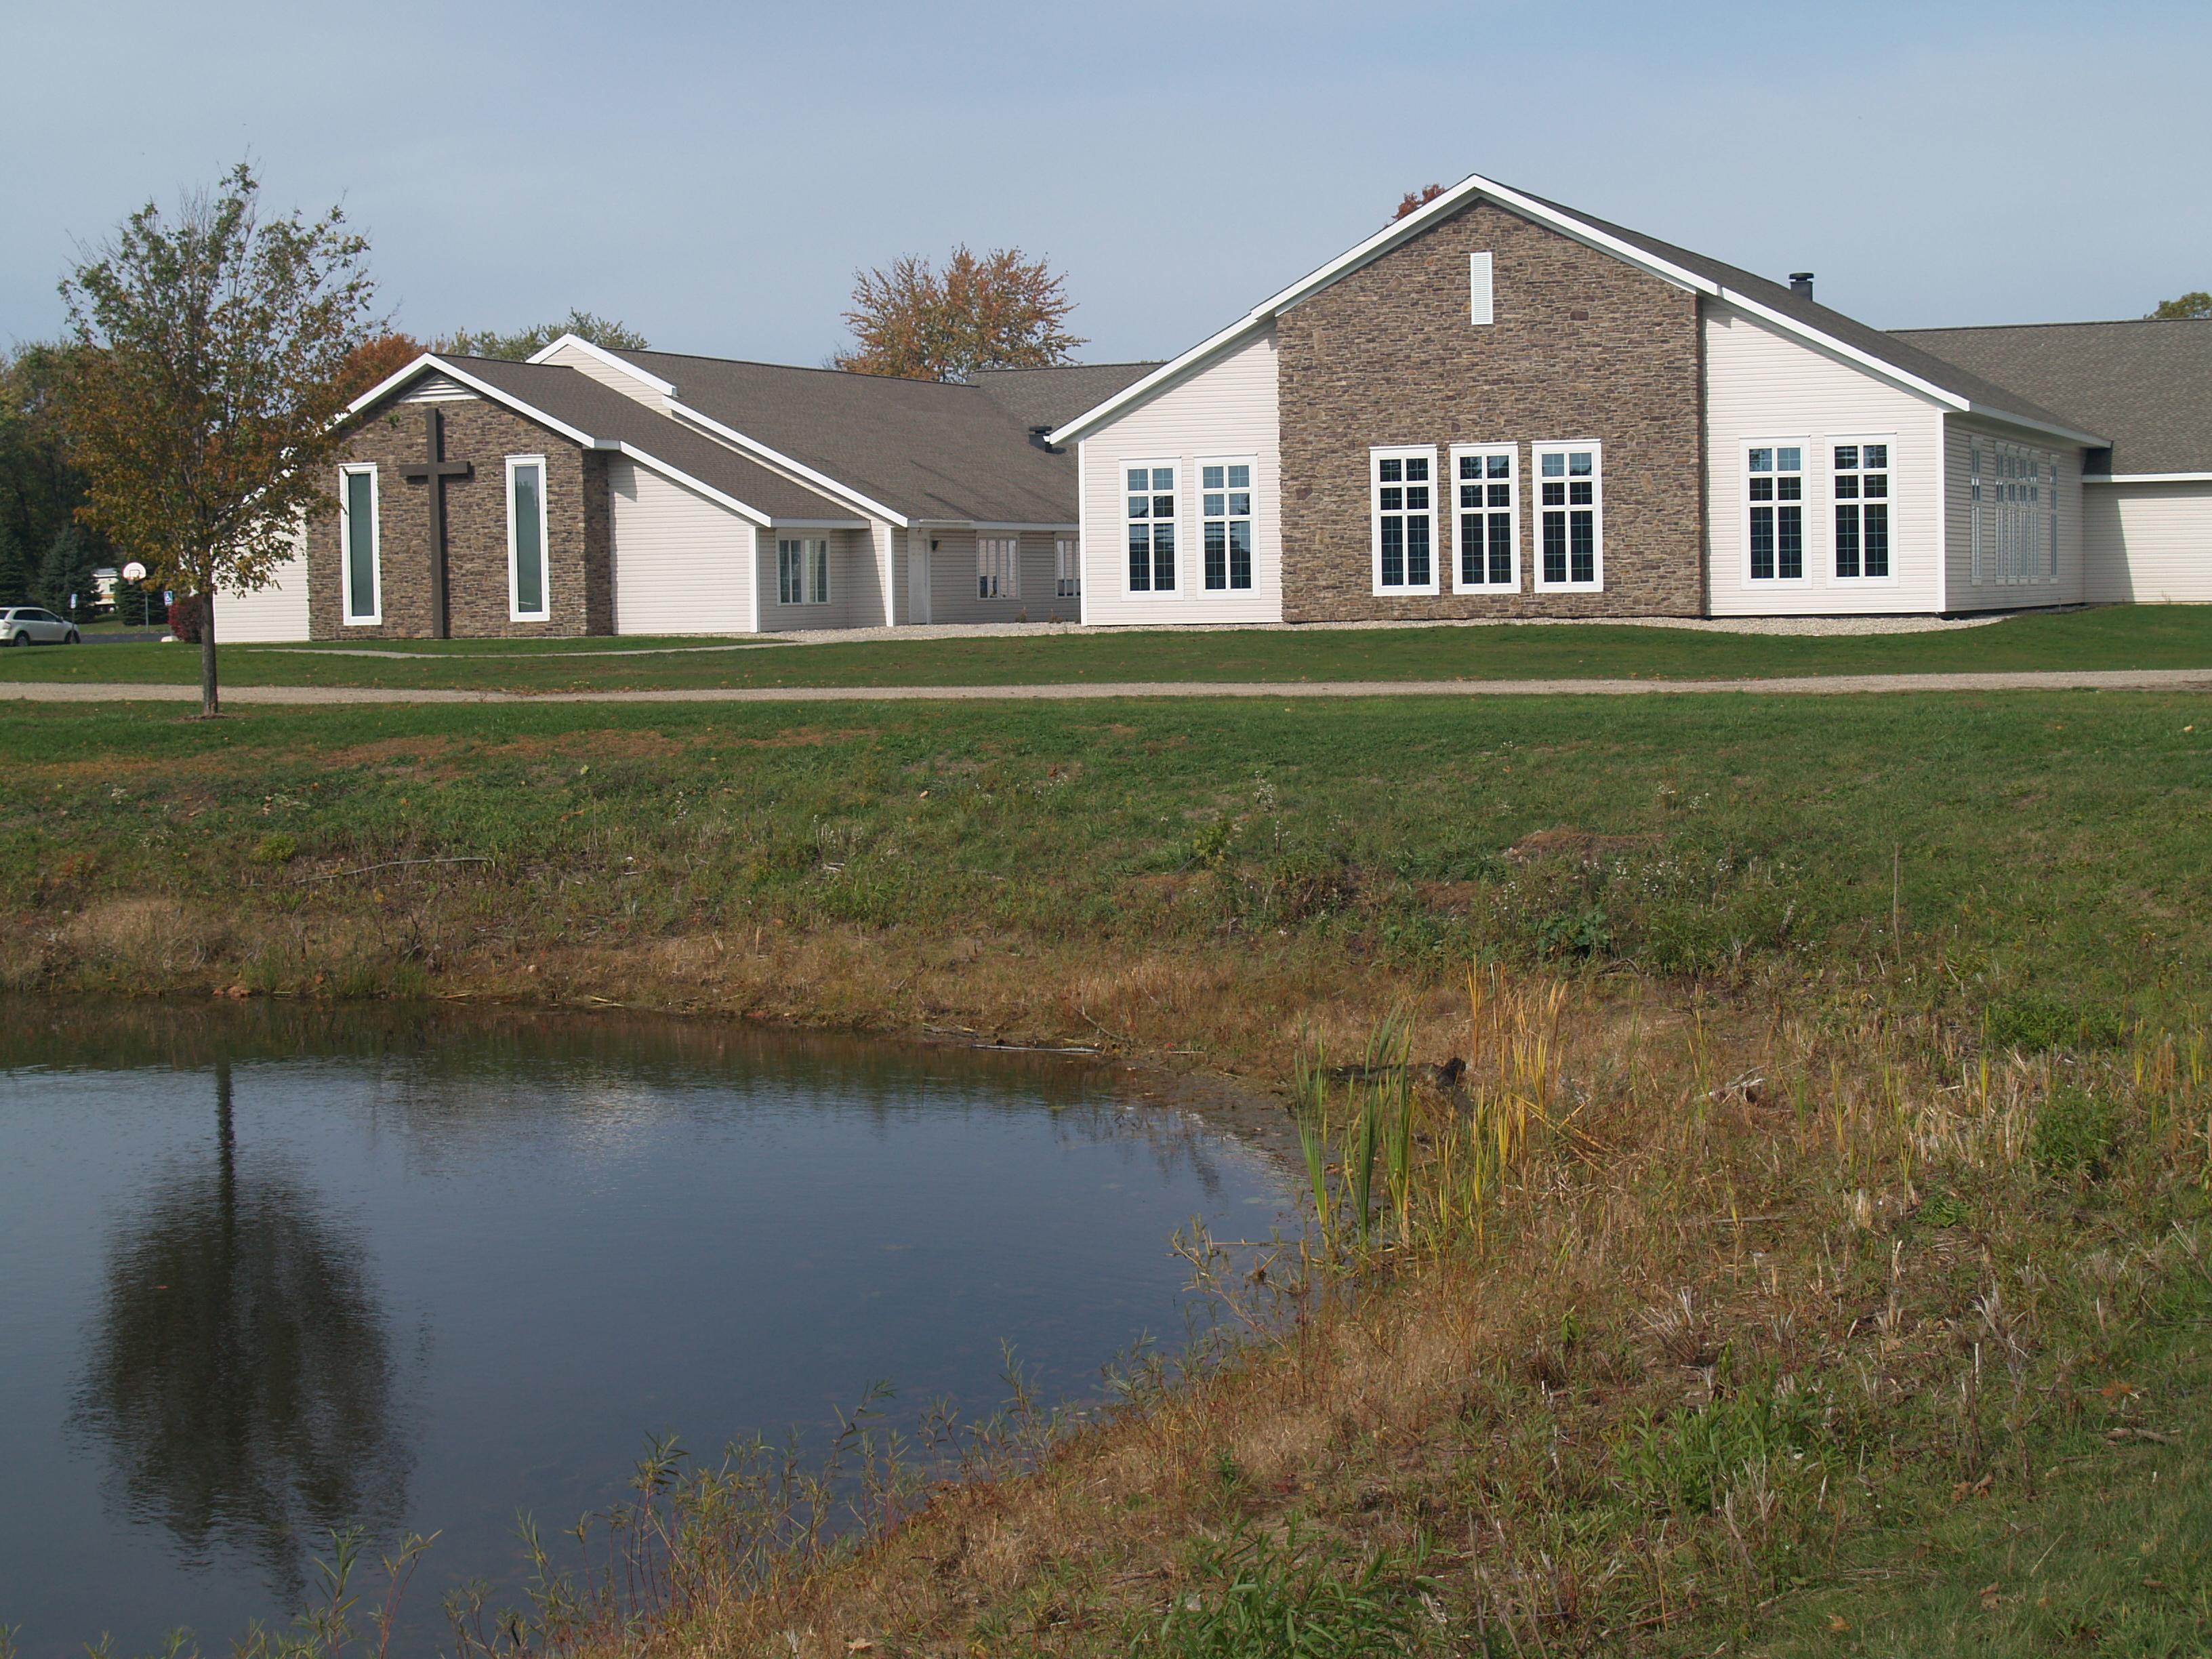 2012-10-16 005